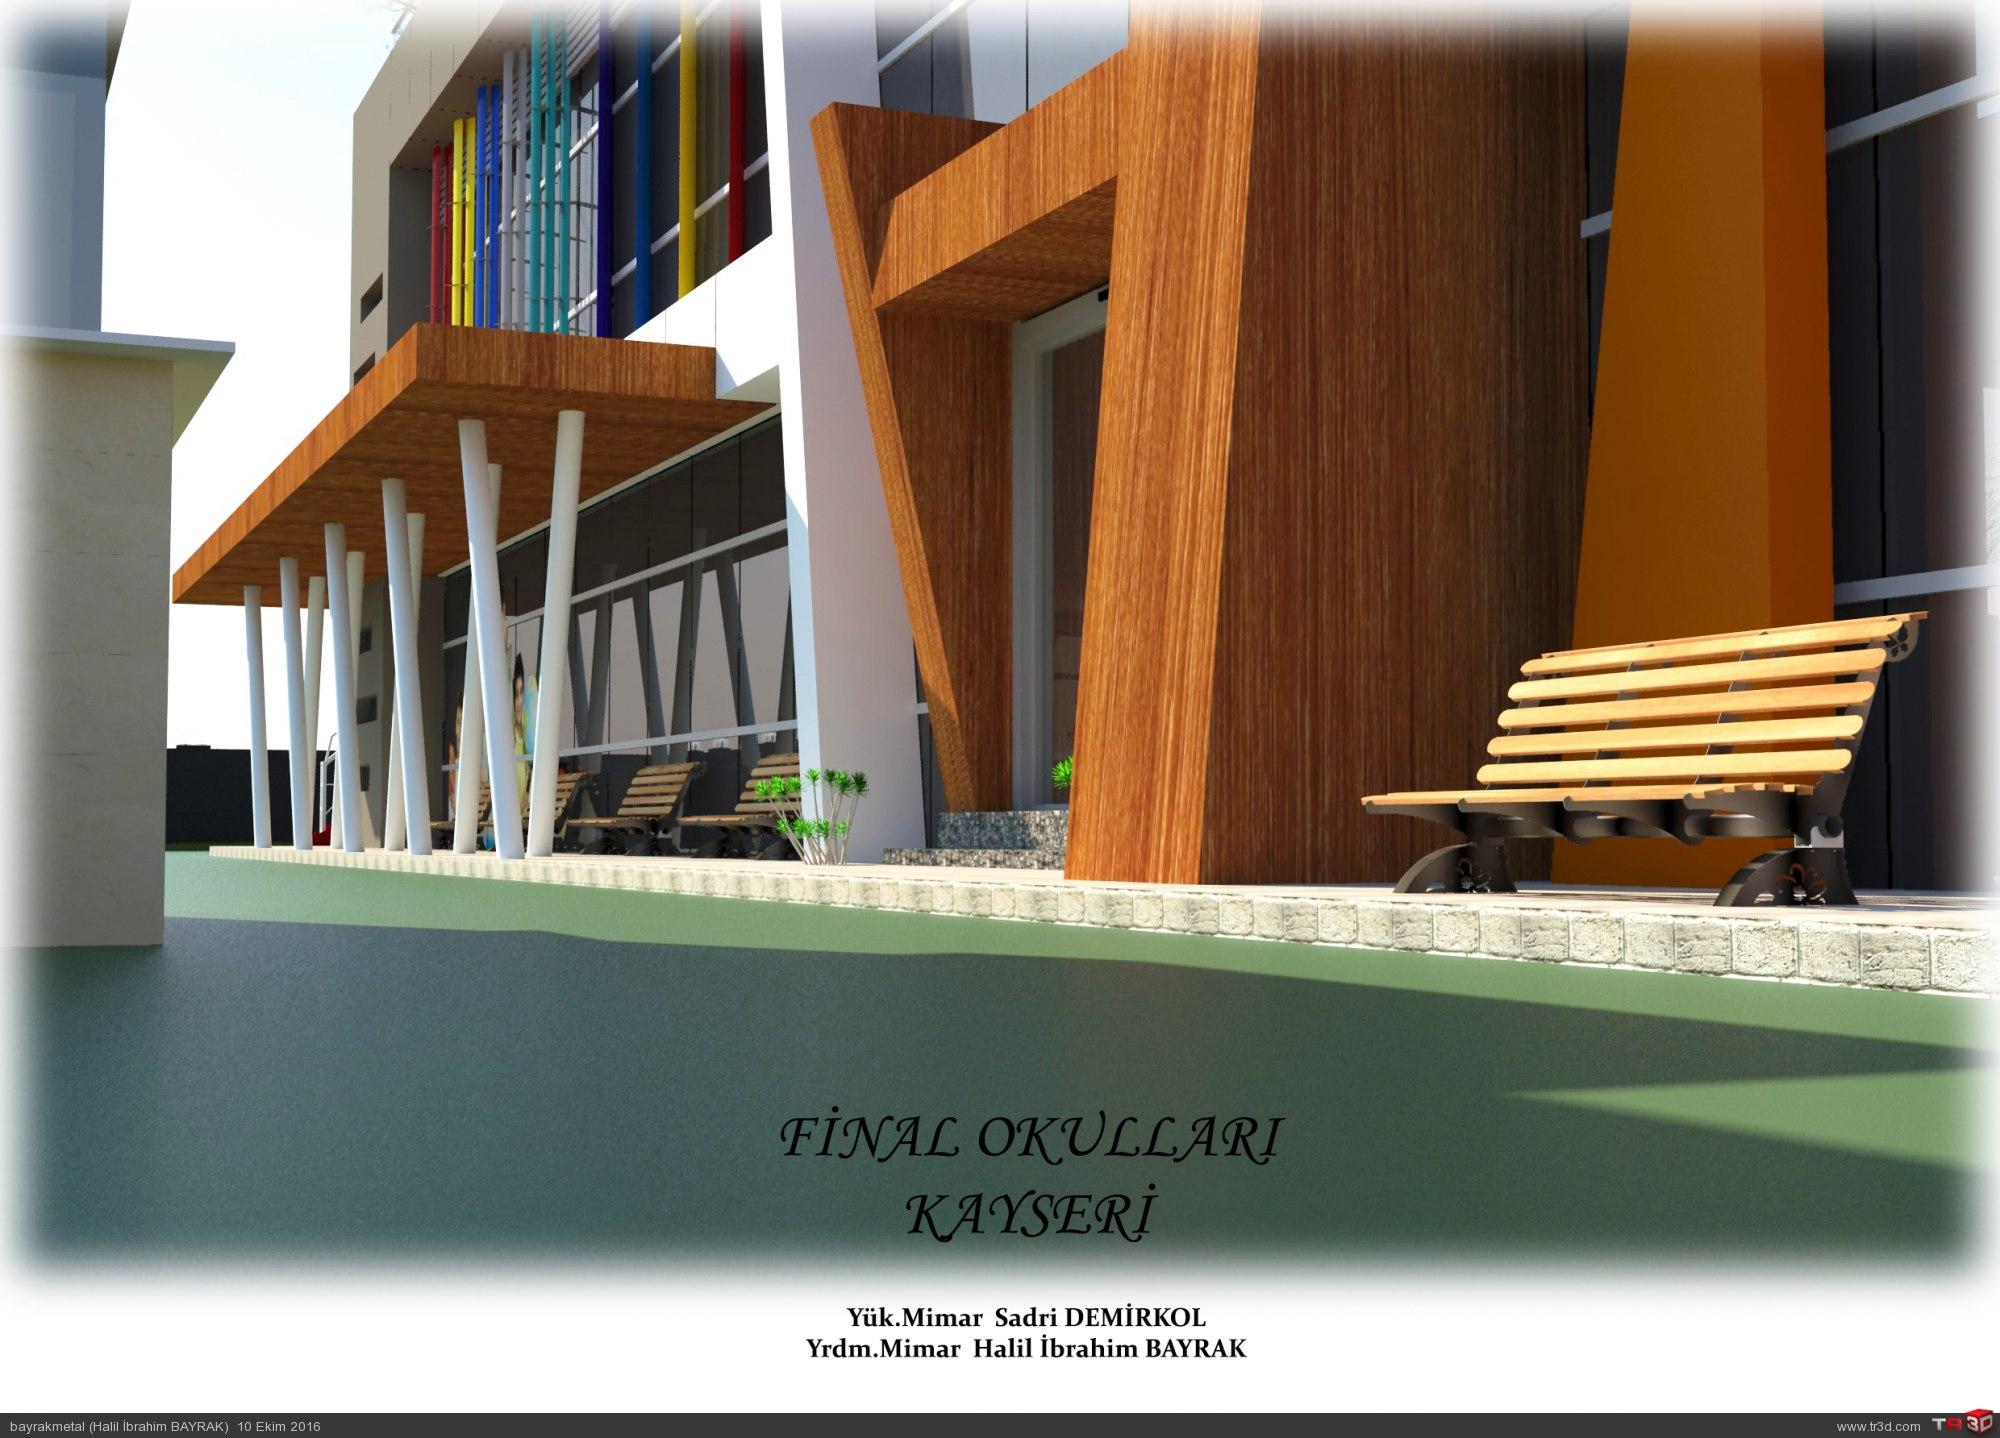 FİNAL KAYSERİ OKULLARI 3